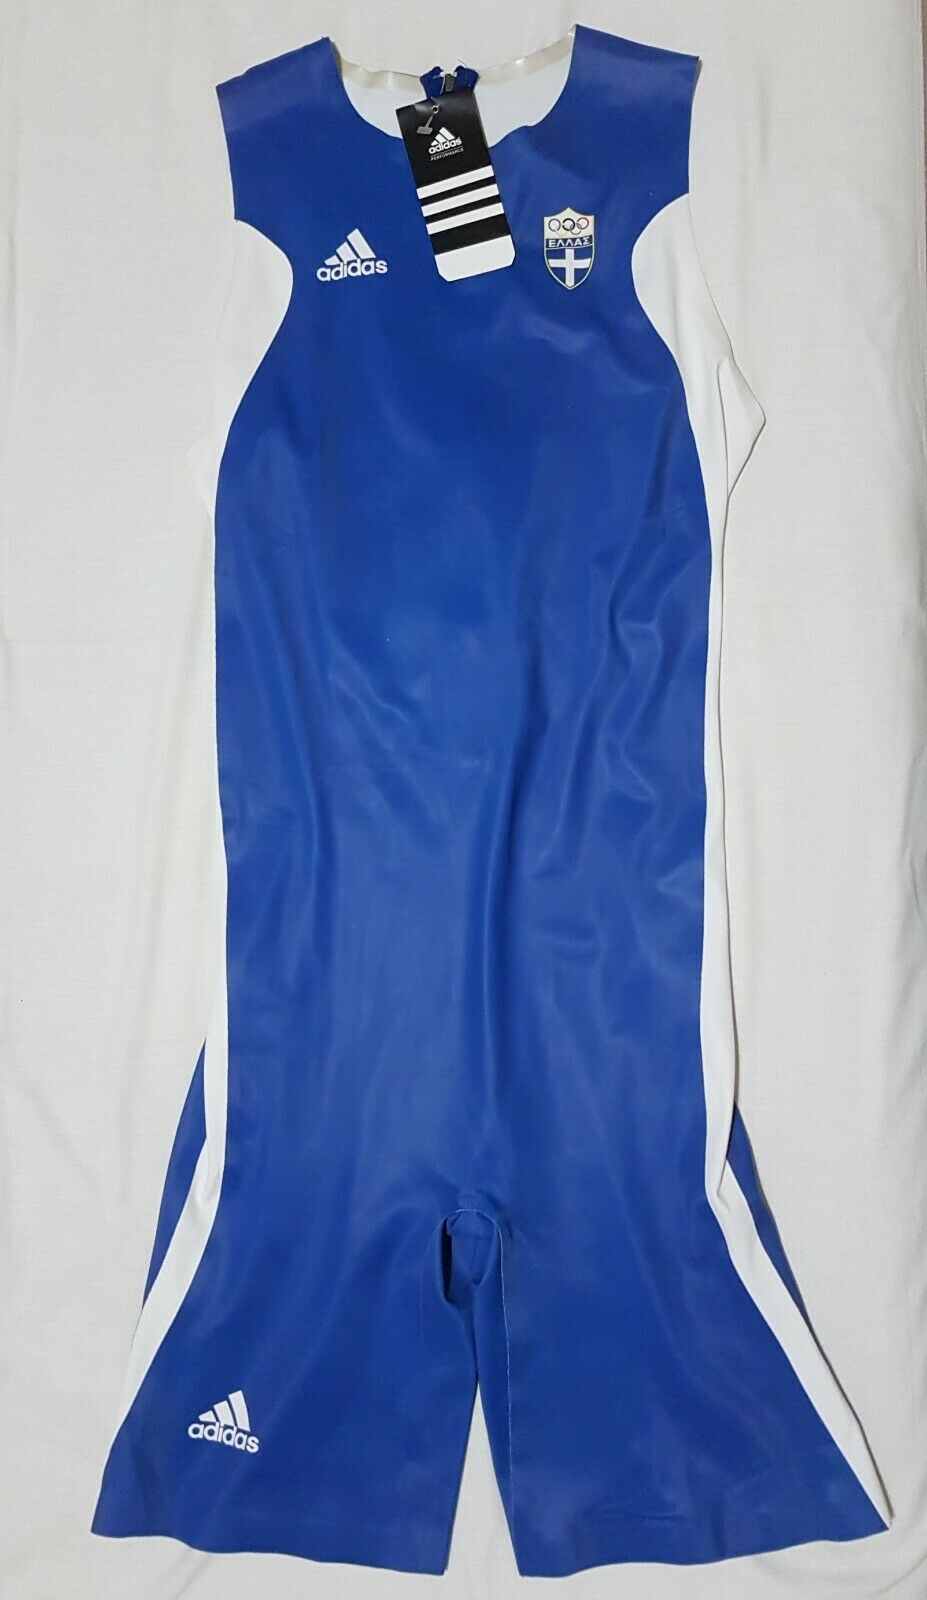 Adidas Performance Hellas Olympic Games Track & Field suit singlet, Größe L, BNWT